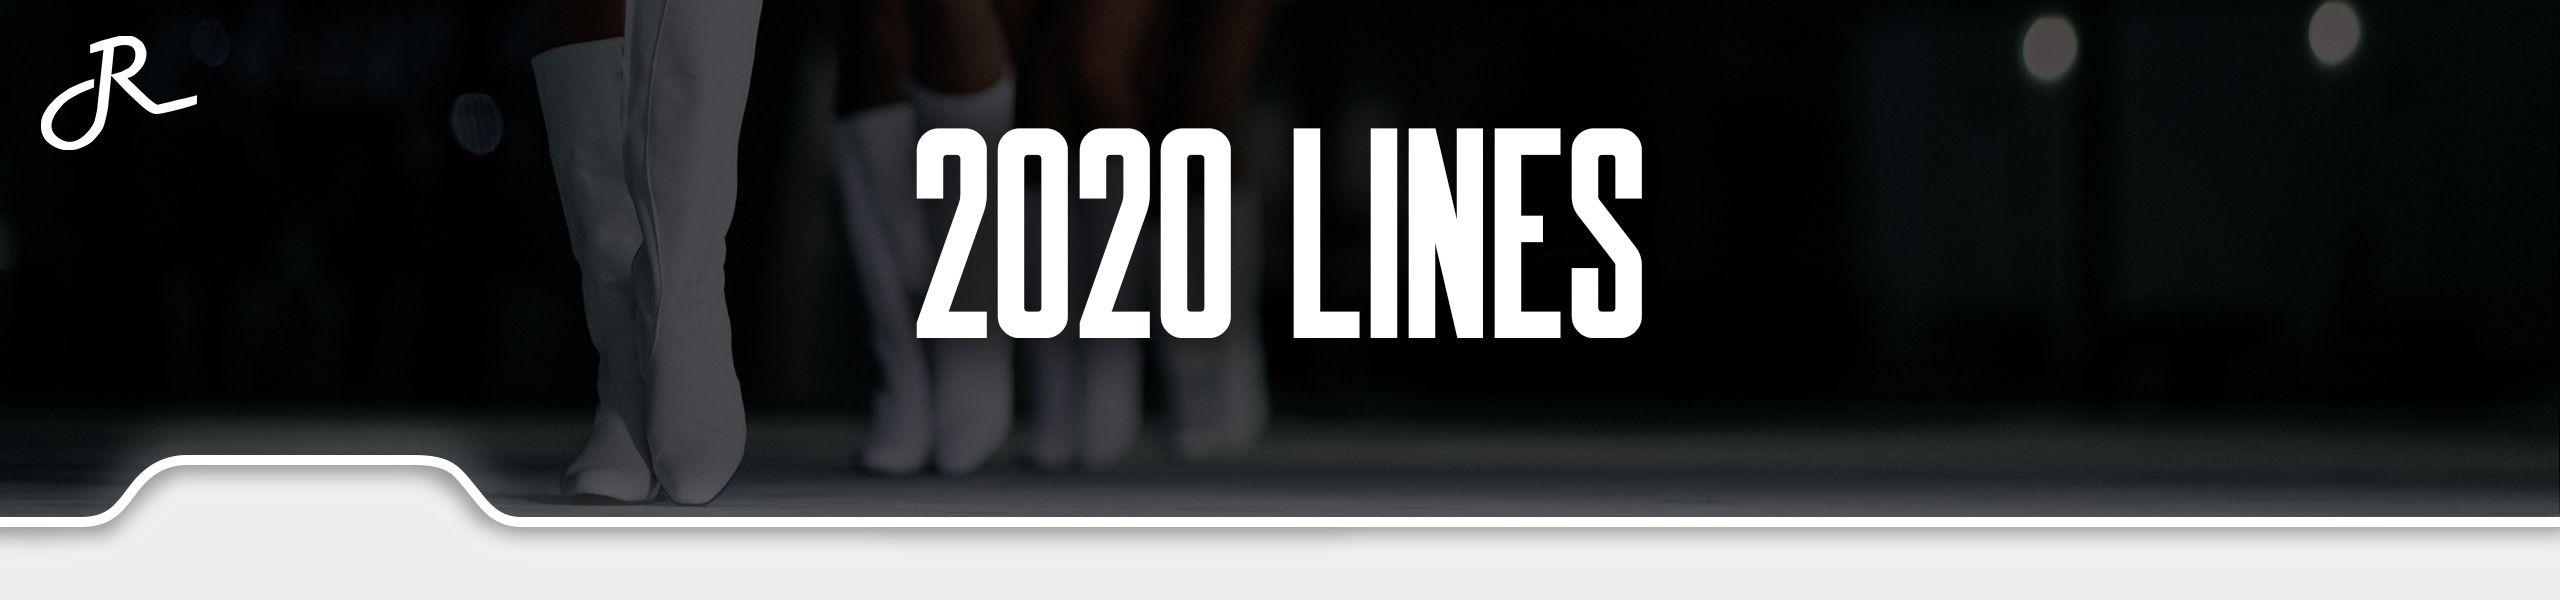 raiderettes-lines-hdr-2020